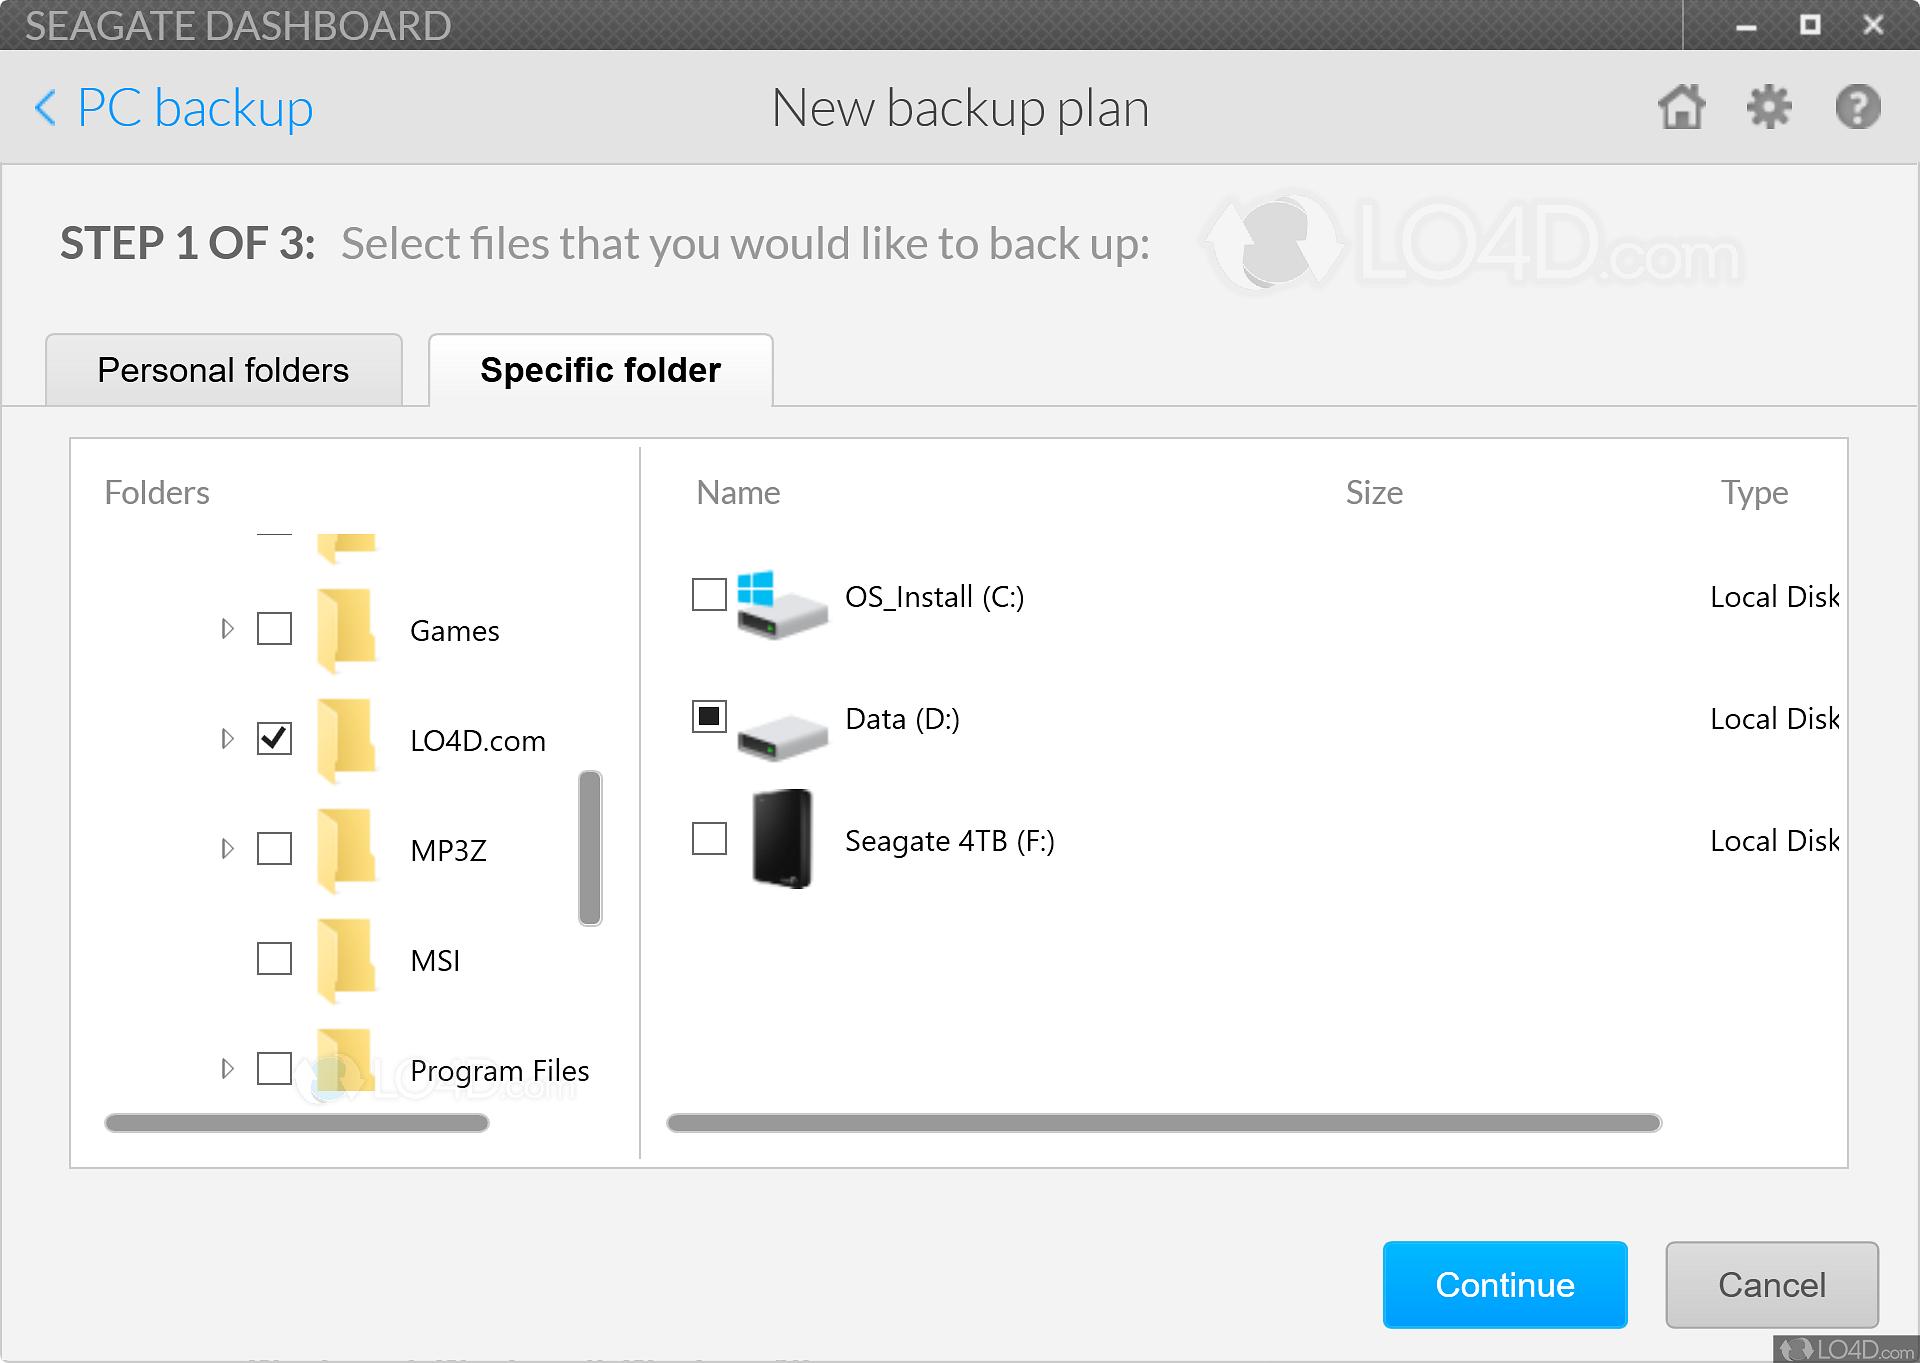 Download seagate dashboard for windows 10